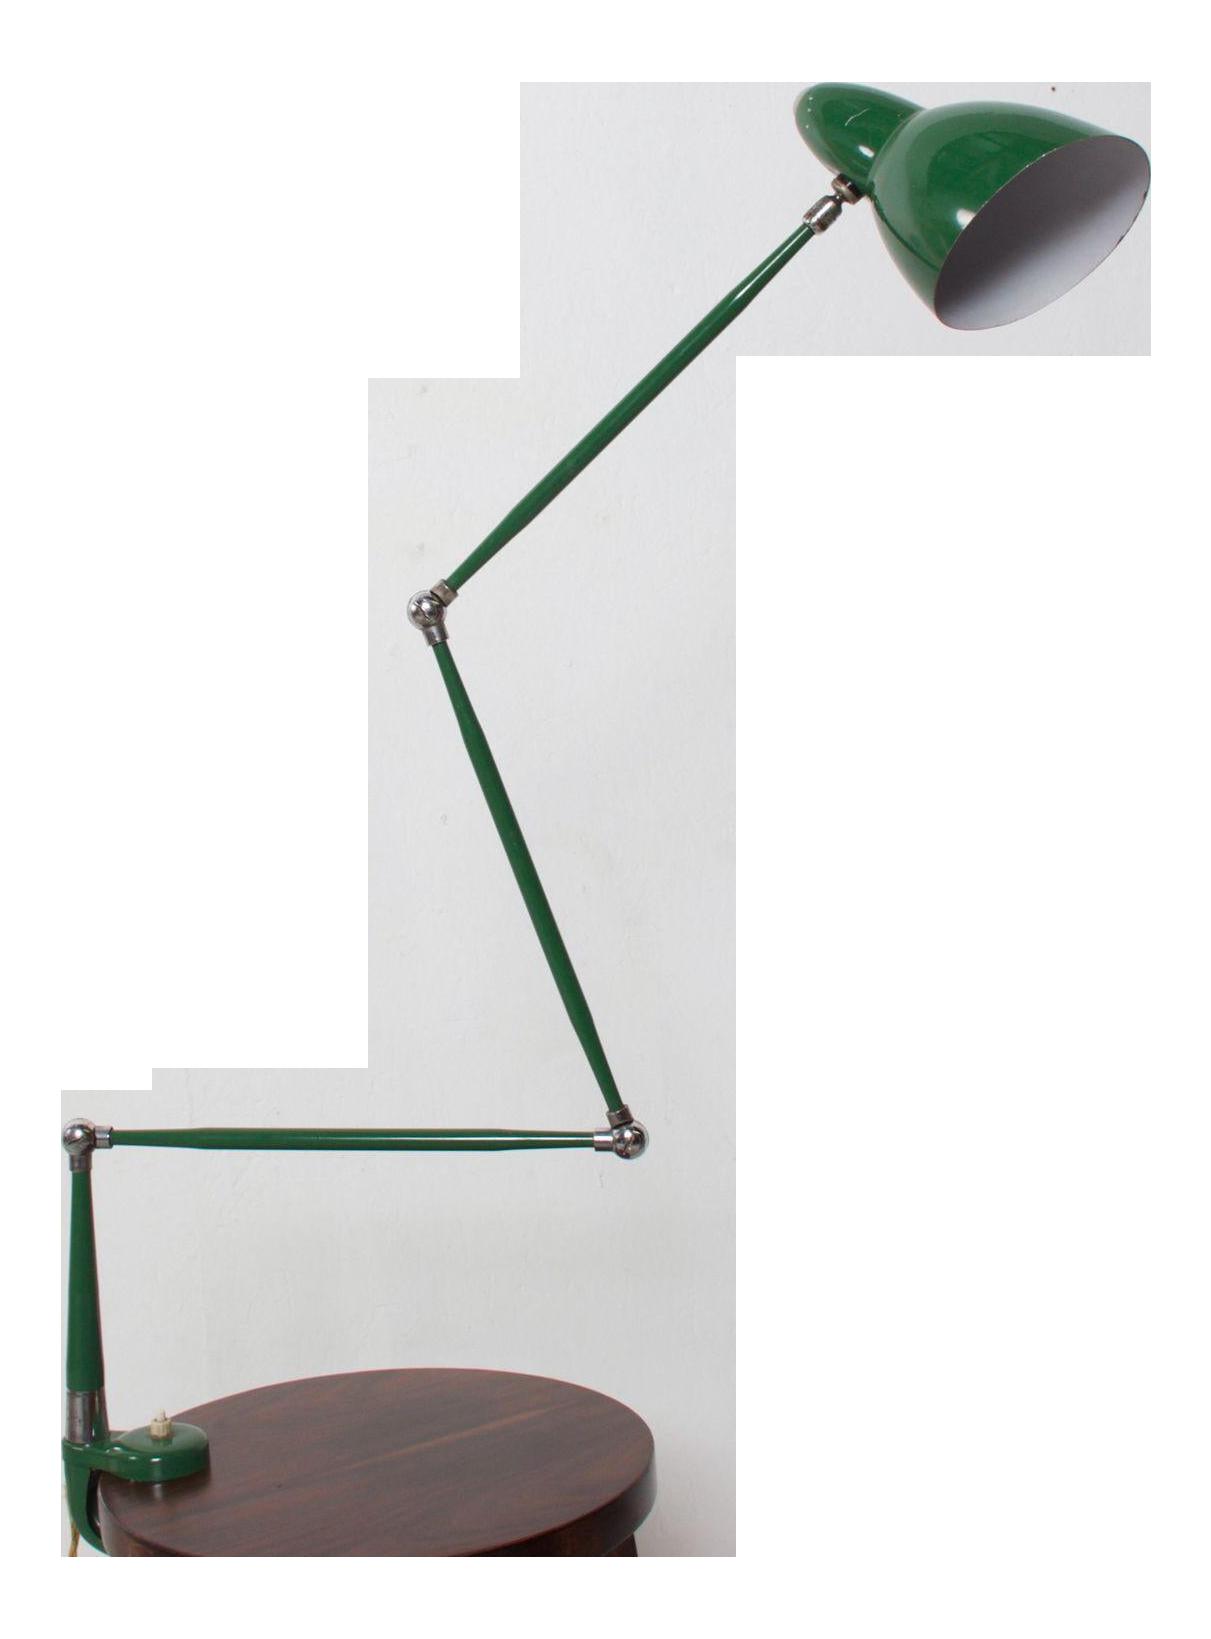 Image of: Italian Midcentury Green Adjustable Clamp Task Desk Lamp By Stilnovo 1950s Chairish